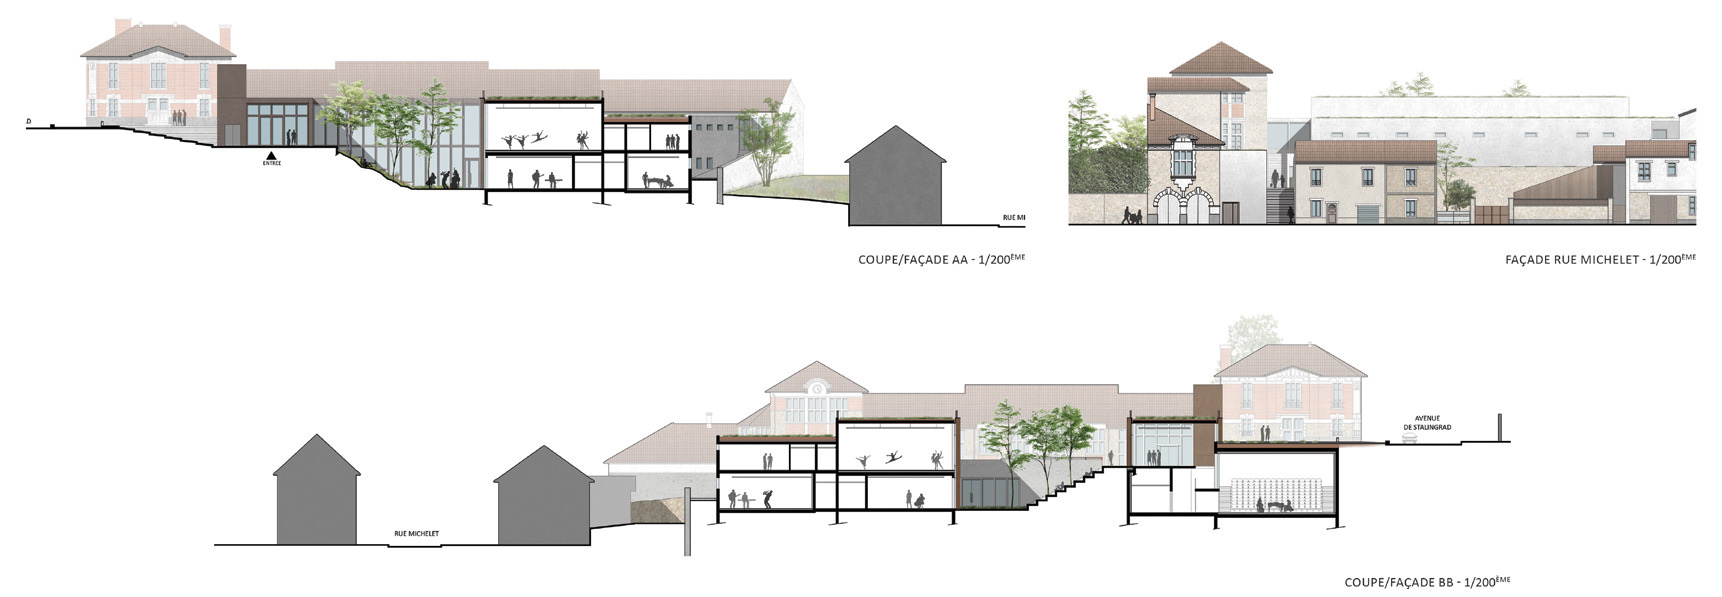 conservatoire_palaiseau_public_outdoor_design_christophe_gautrand_paysagiste_6.jpg